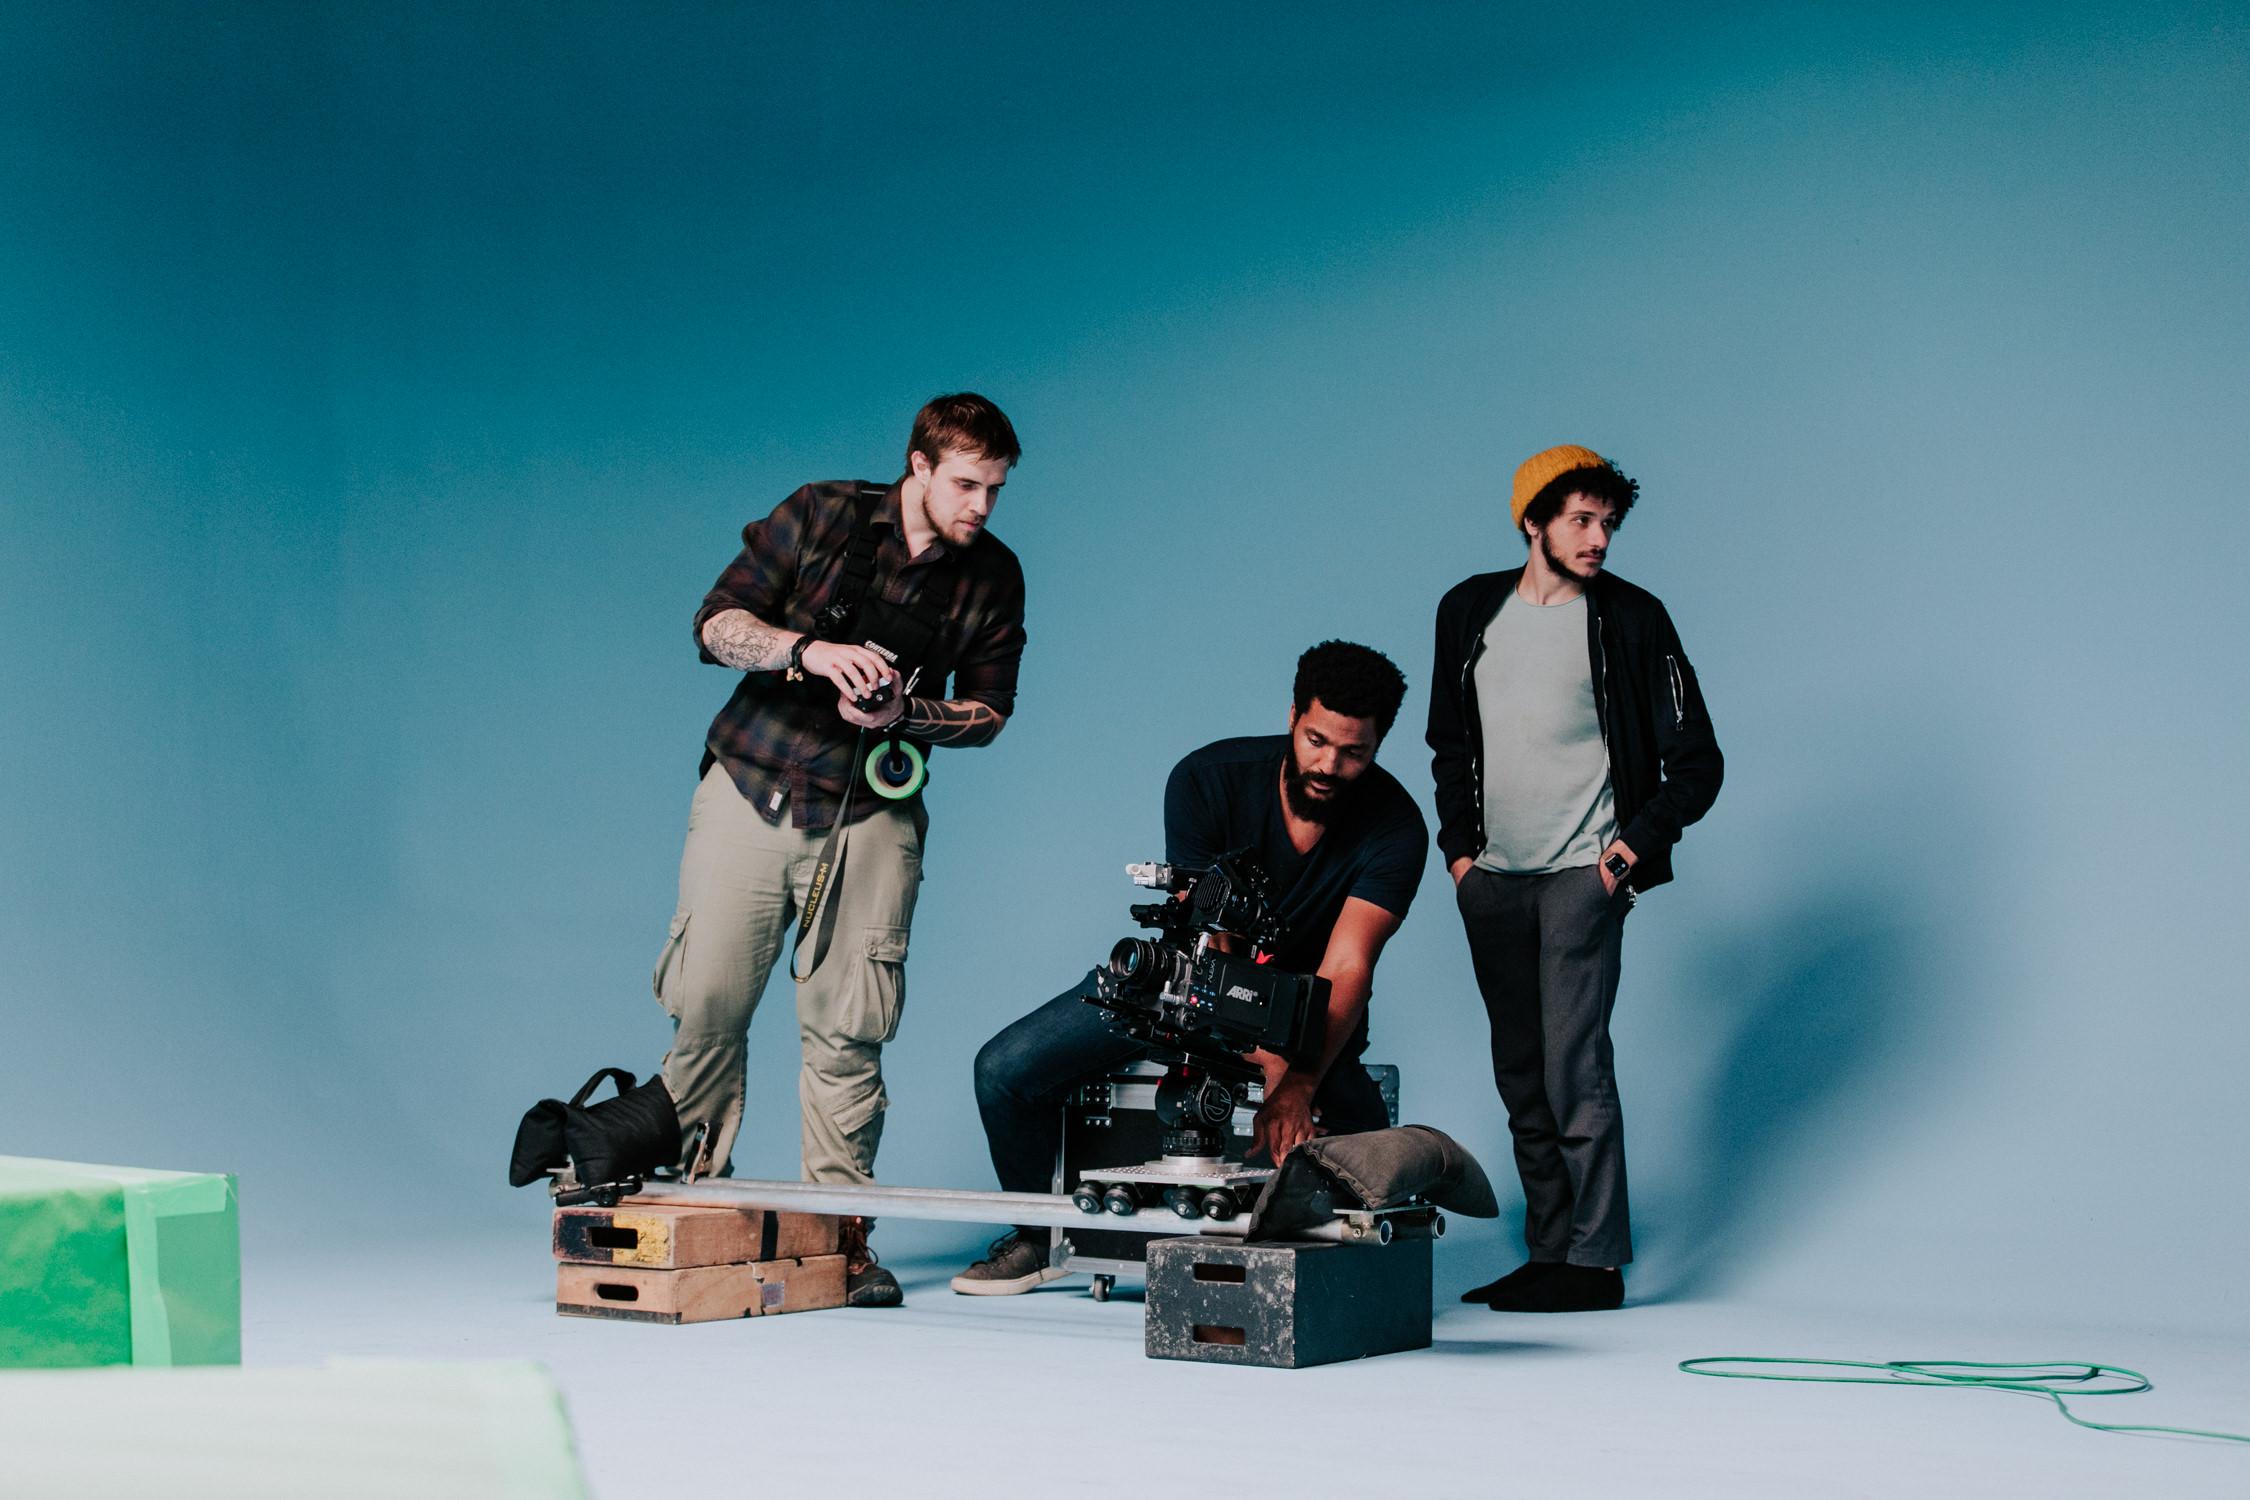 music-video-bts-blue-cyc-wall-crew-AnnaLeeMedia